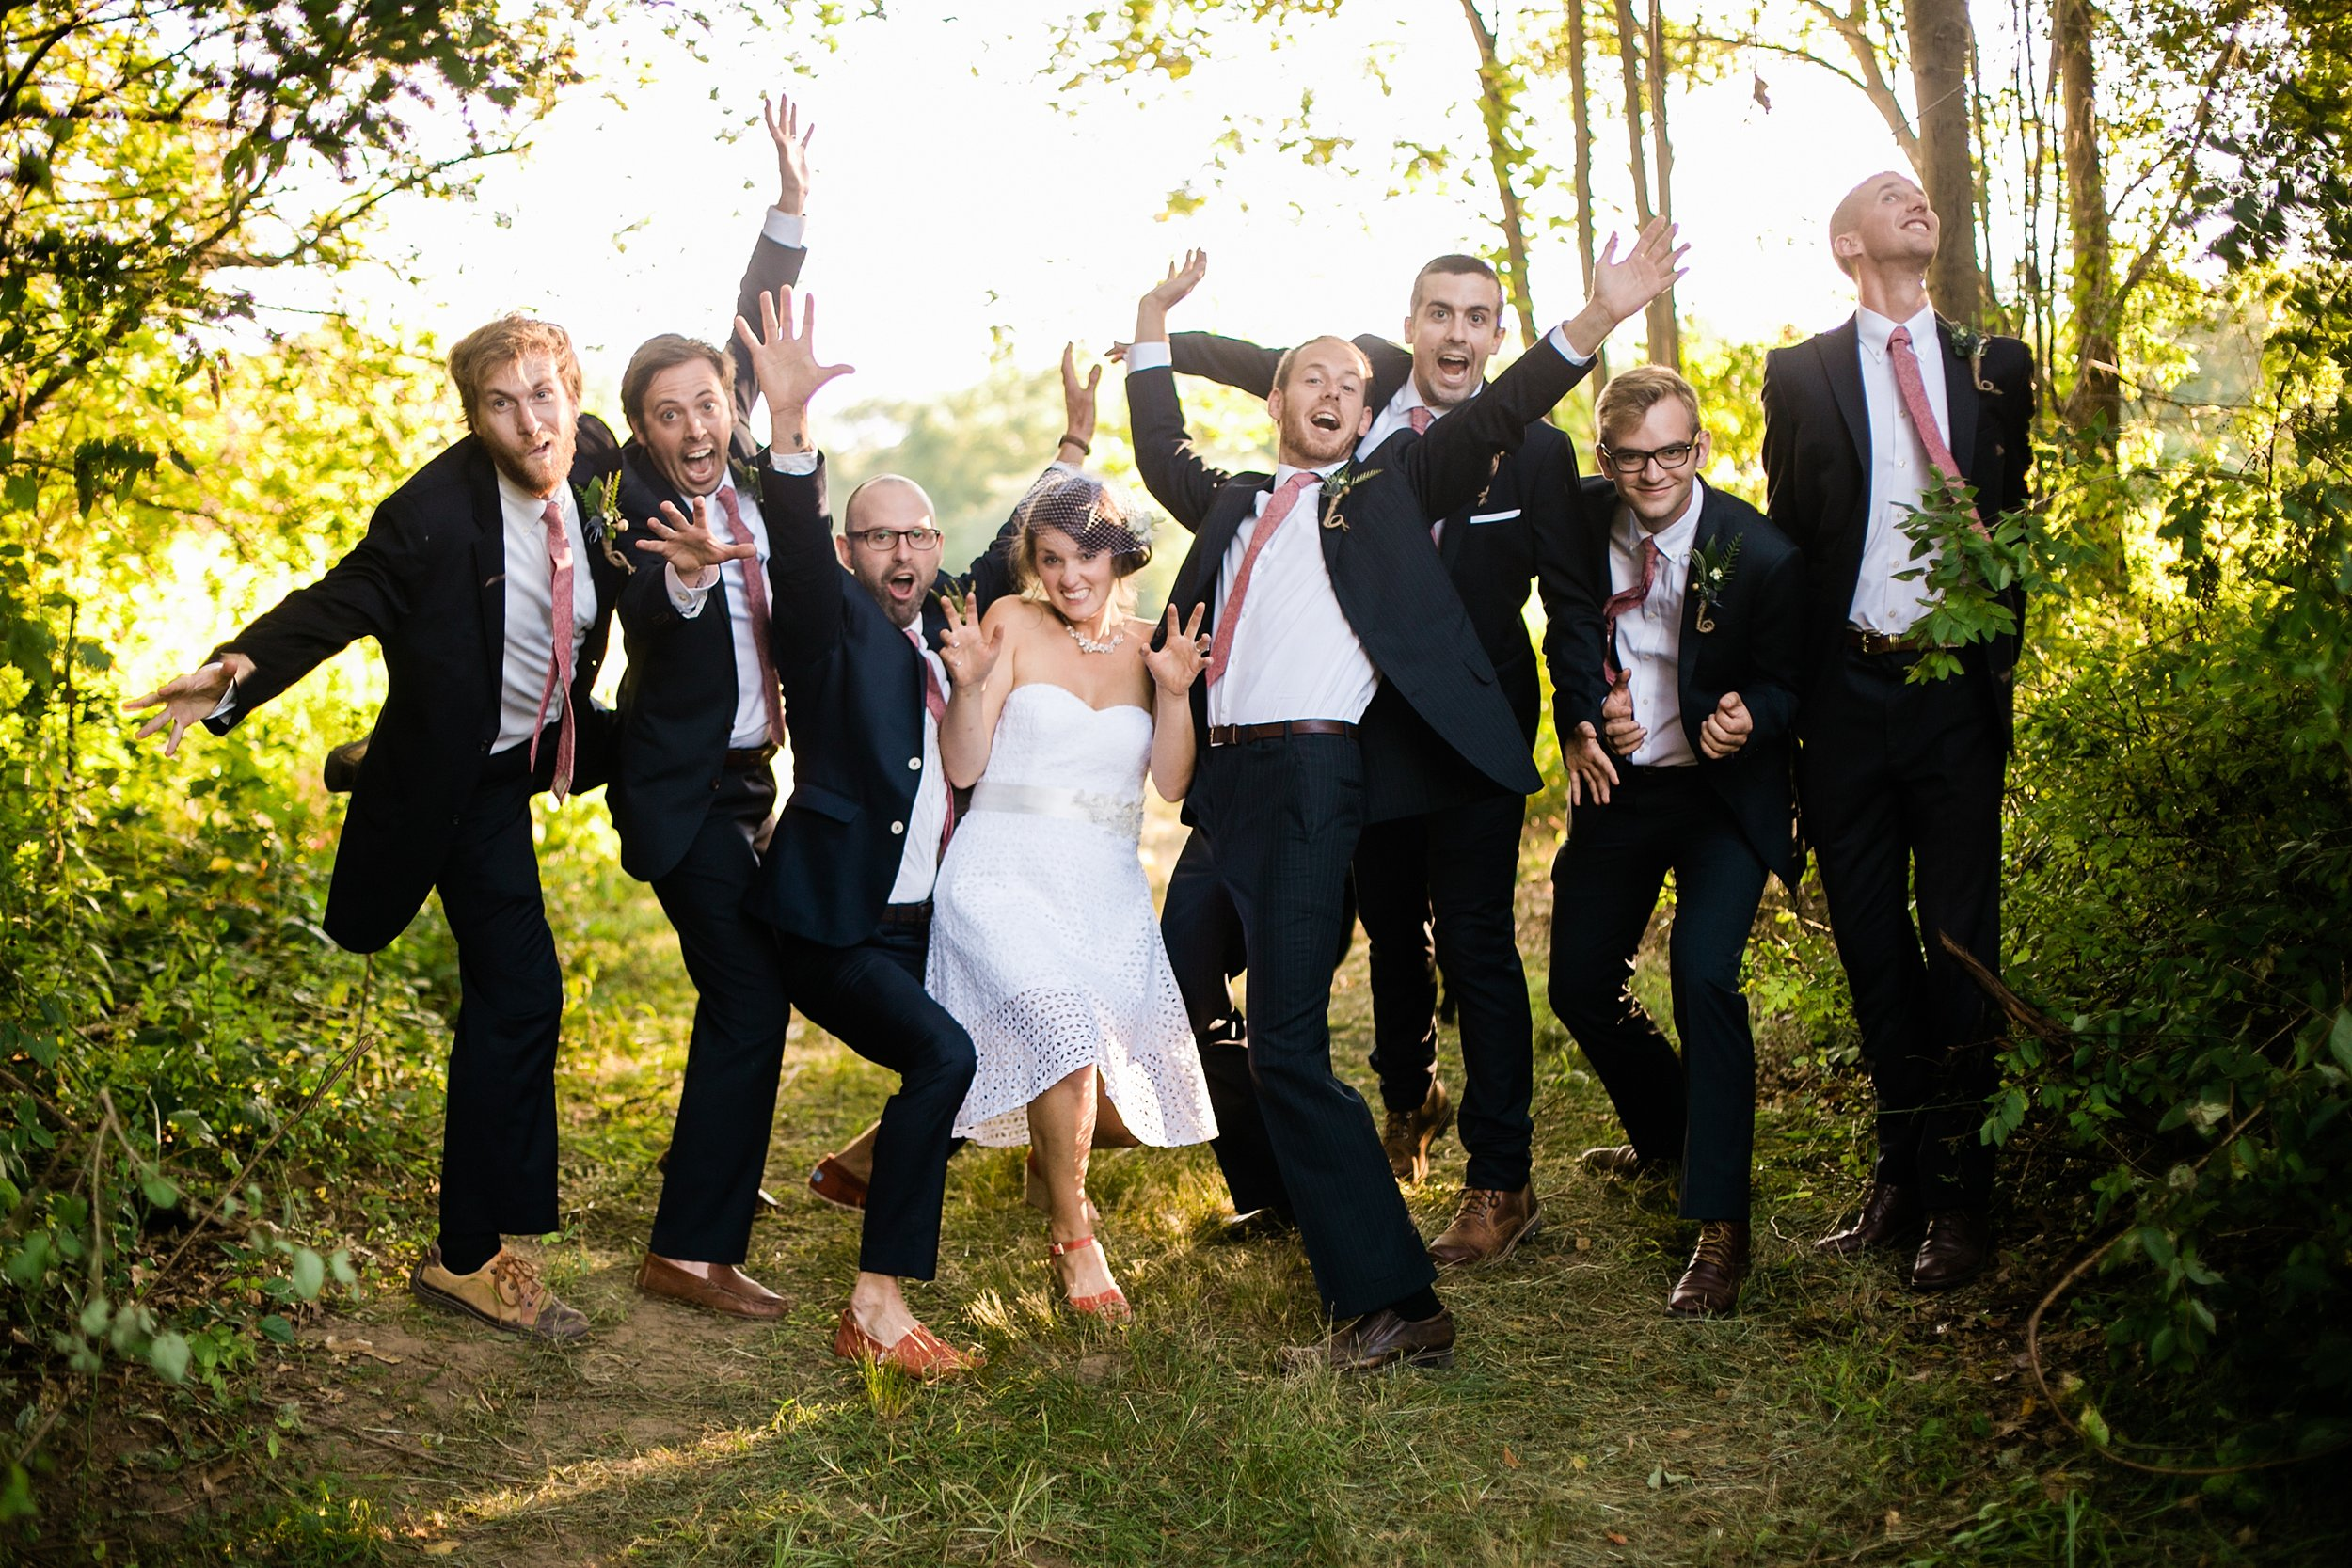 063 los angeles wedding photographer.jpg